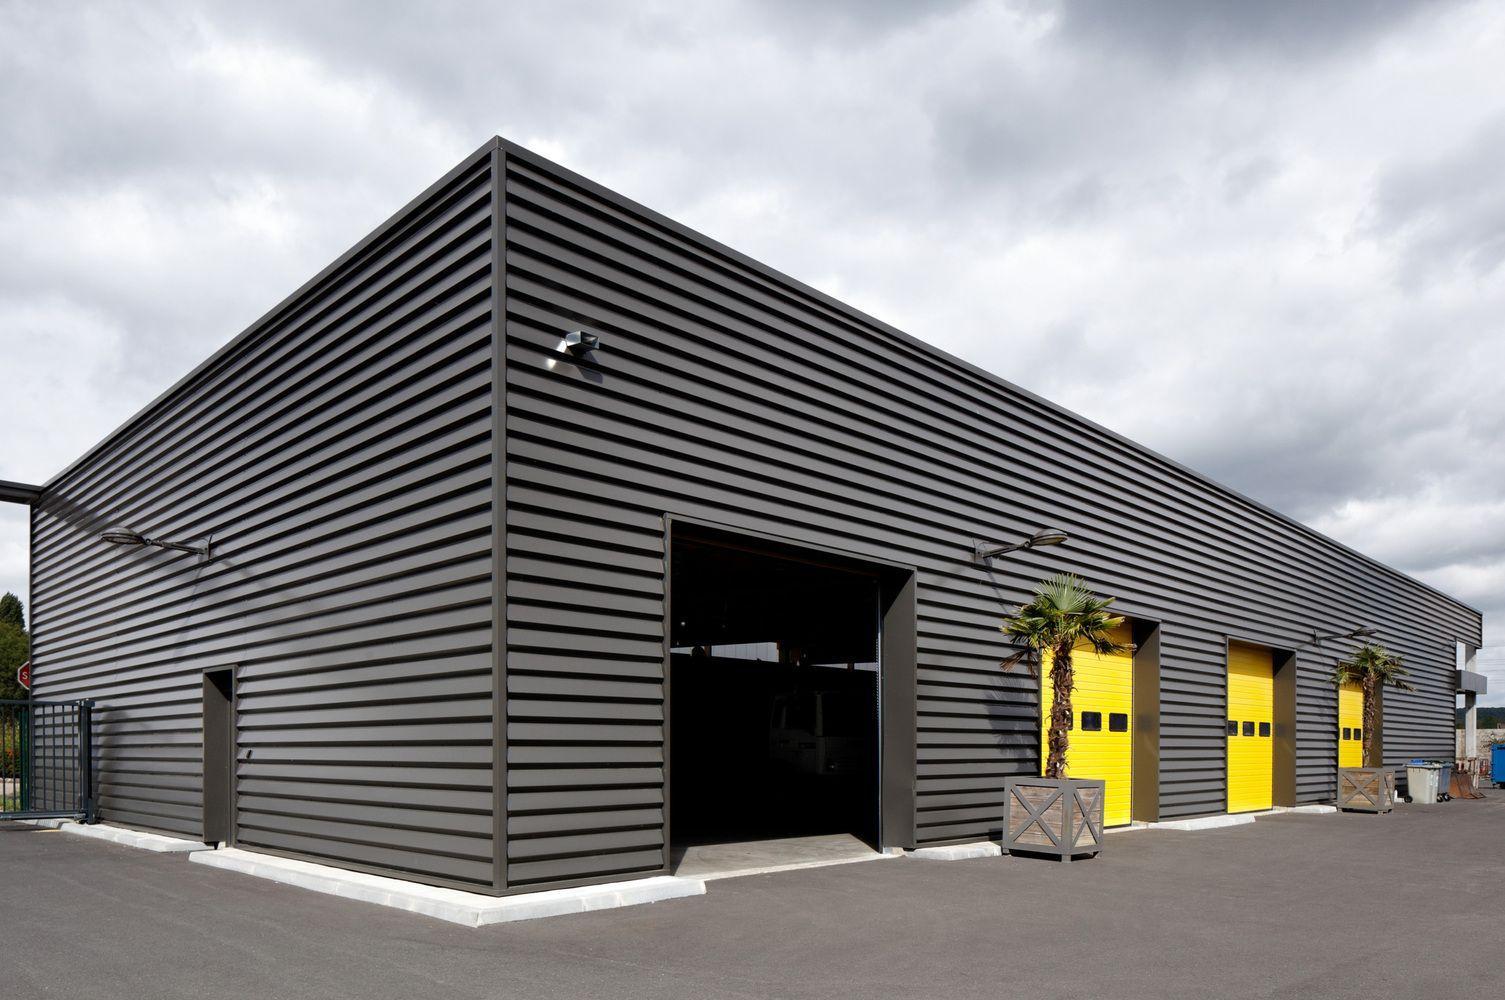 Gallery Of Municipal Technical Center Studios Architecture 19 Warehouse Design Factory Architecture Garage Design